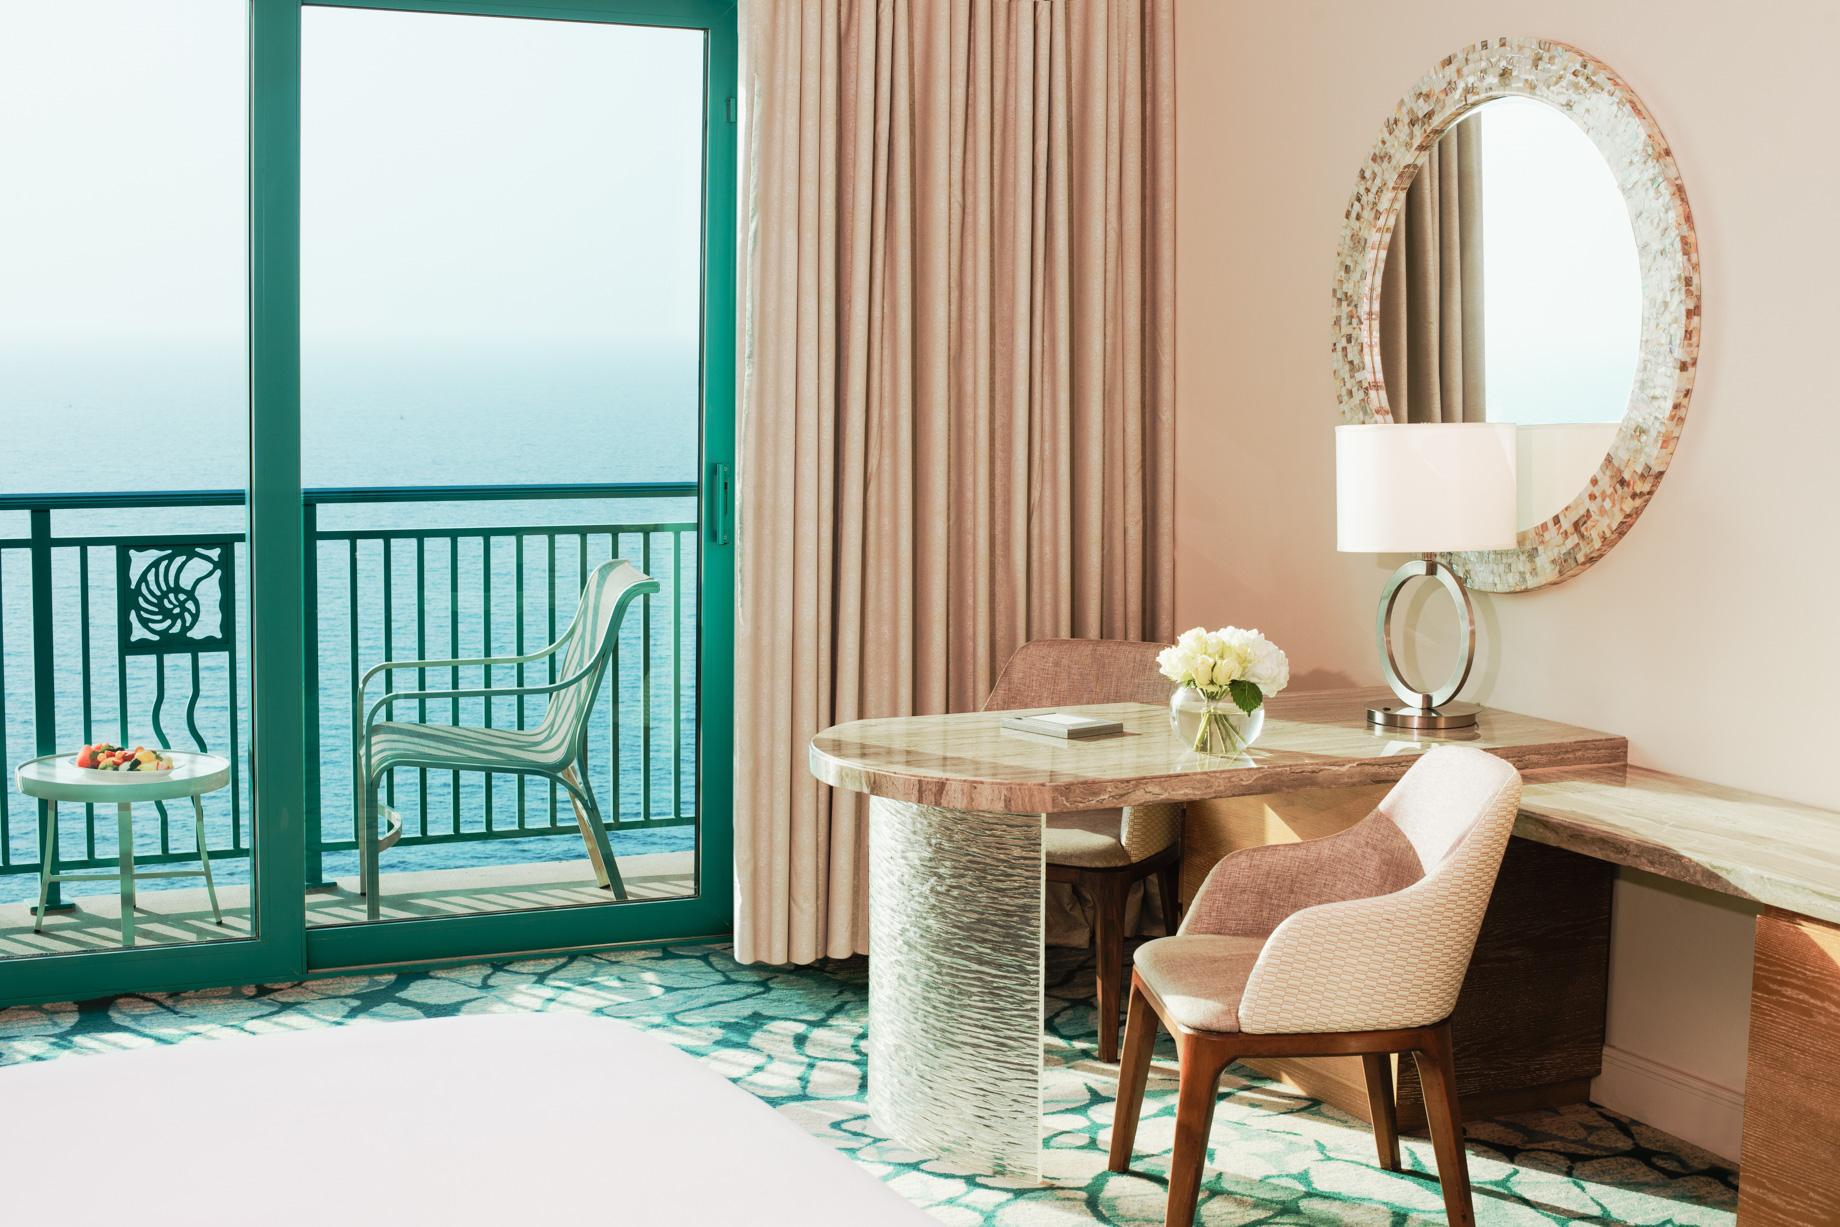 Atlantis The Palm Luxury Resort – Crescent Rd, Dubai, UAE – Ocean View Room Desk